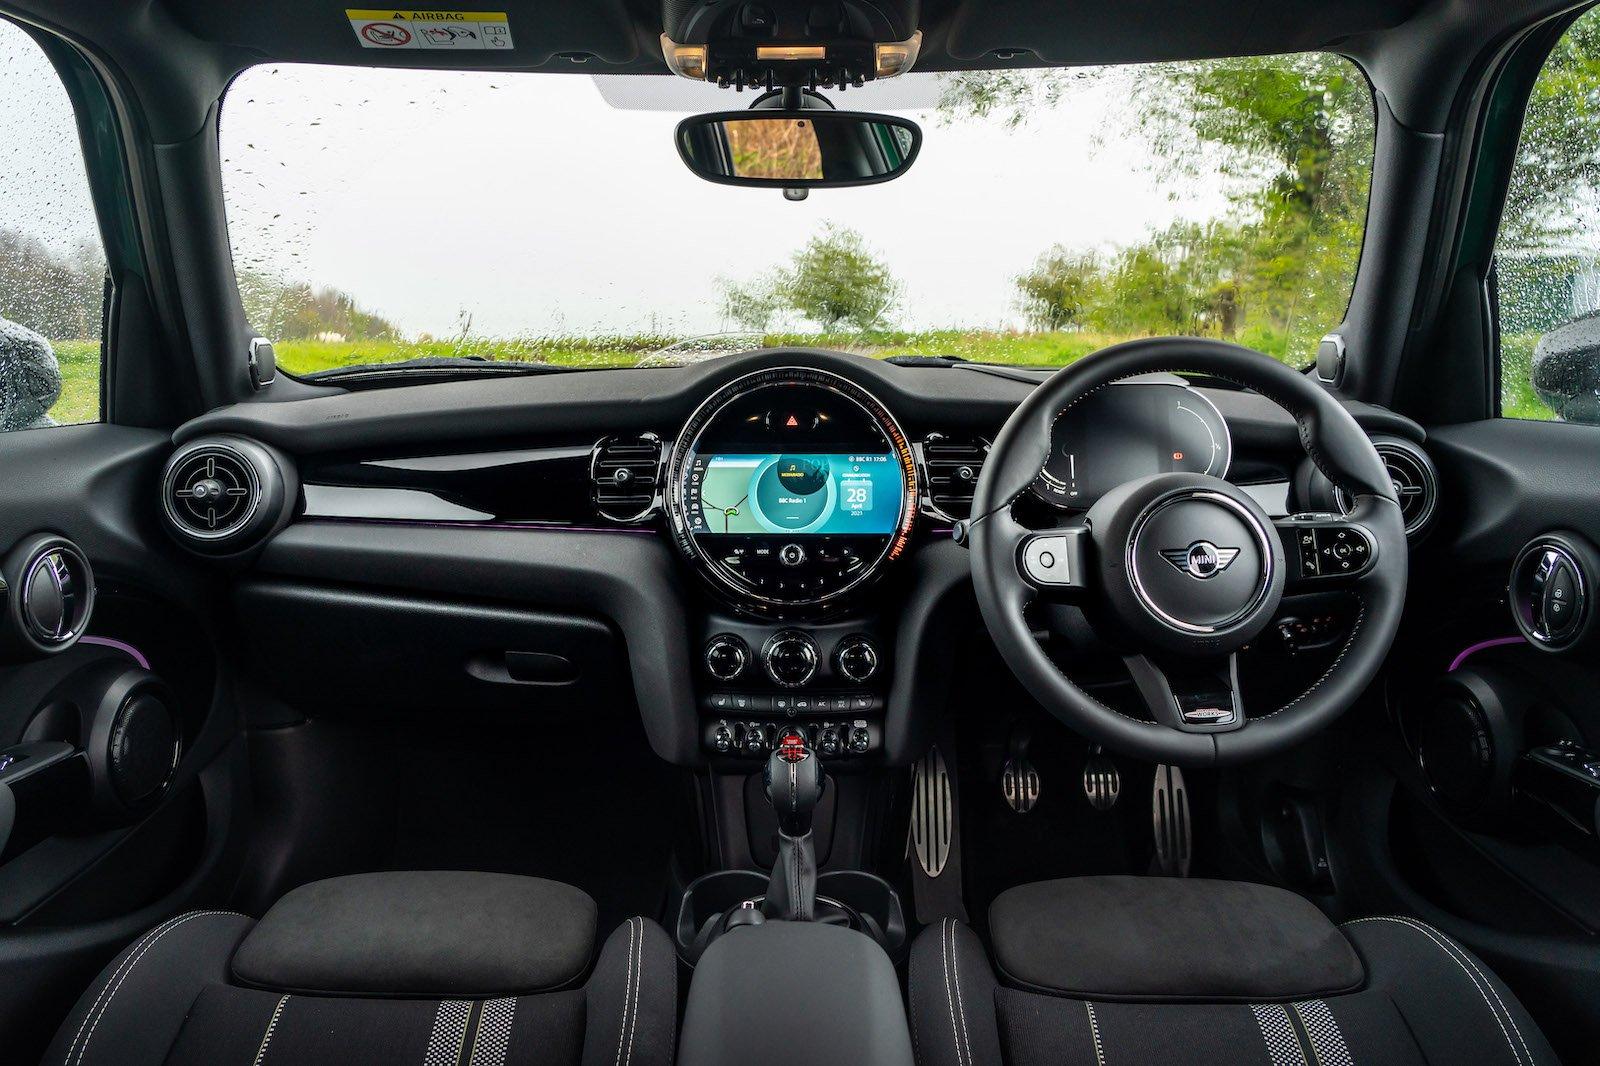 2021 Mini Cooper dash